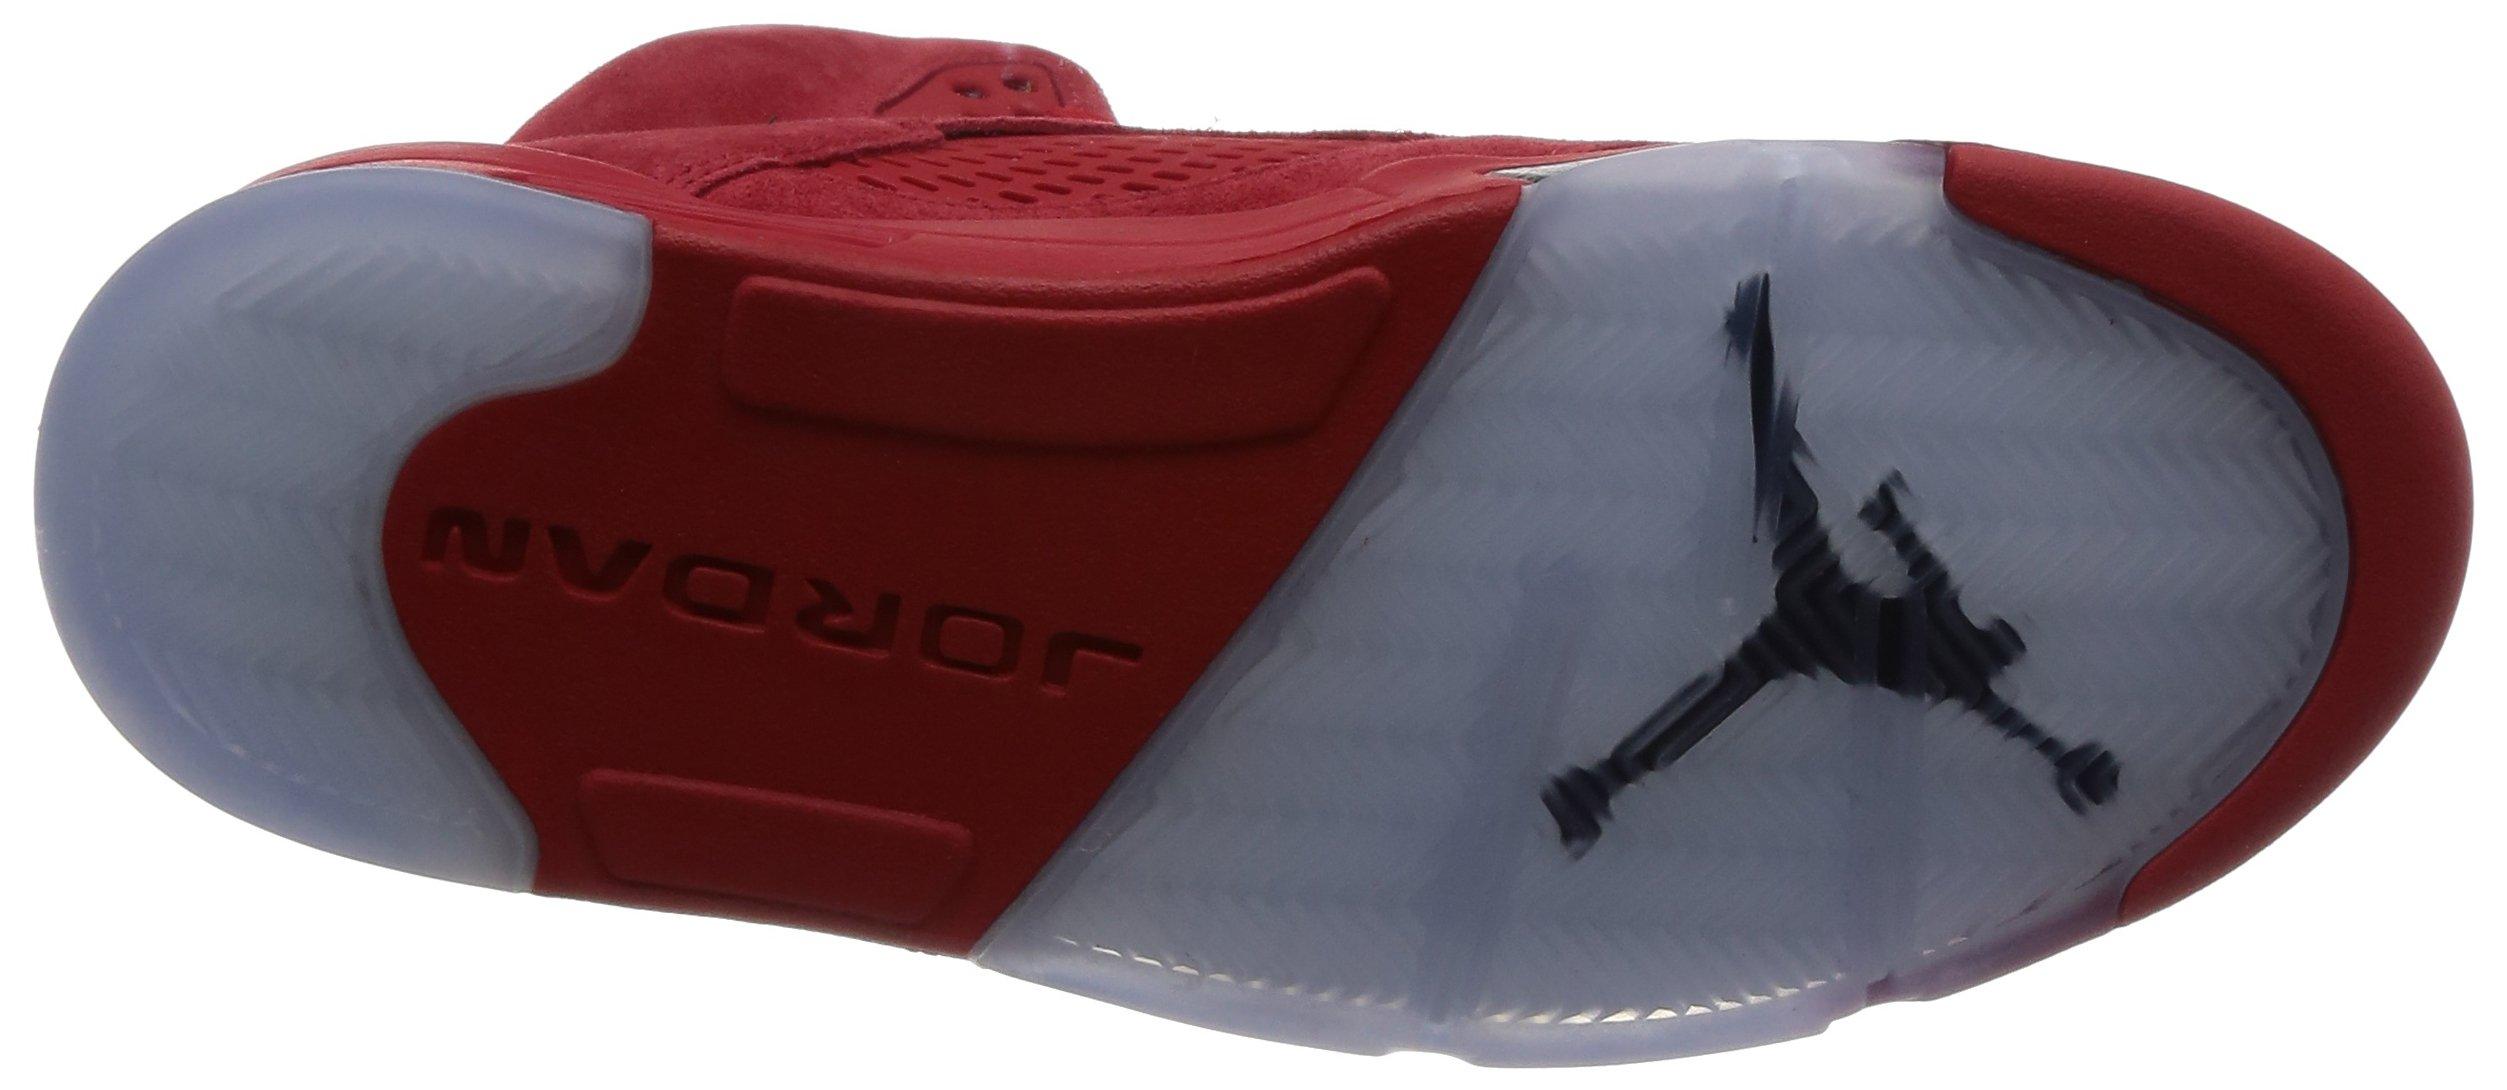 71u6HMeGMQL - Nike Air Jordan 5 Retro 'Red Suede' - 136027-602 - Size 9 -